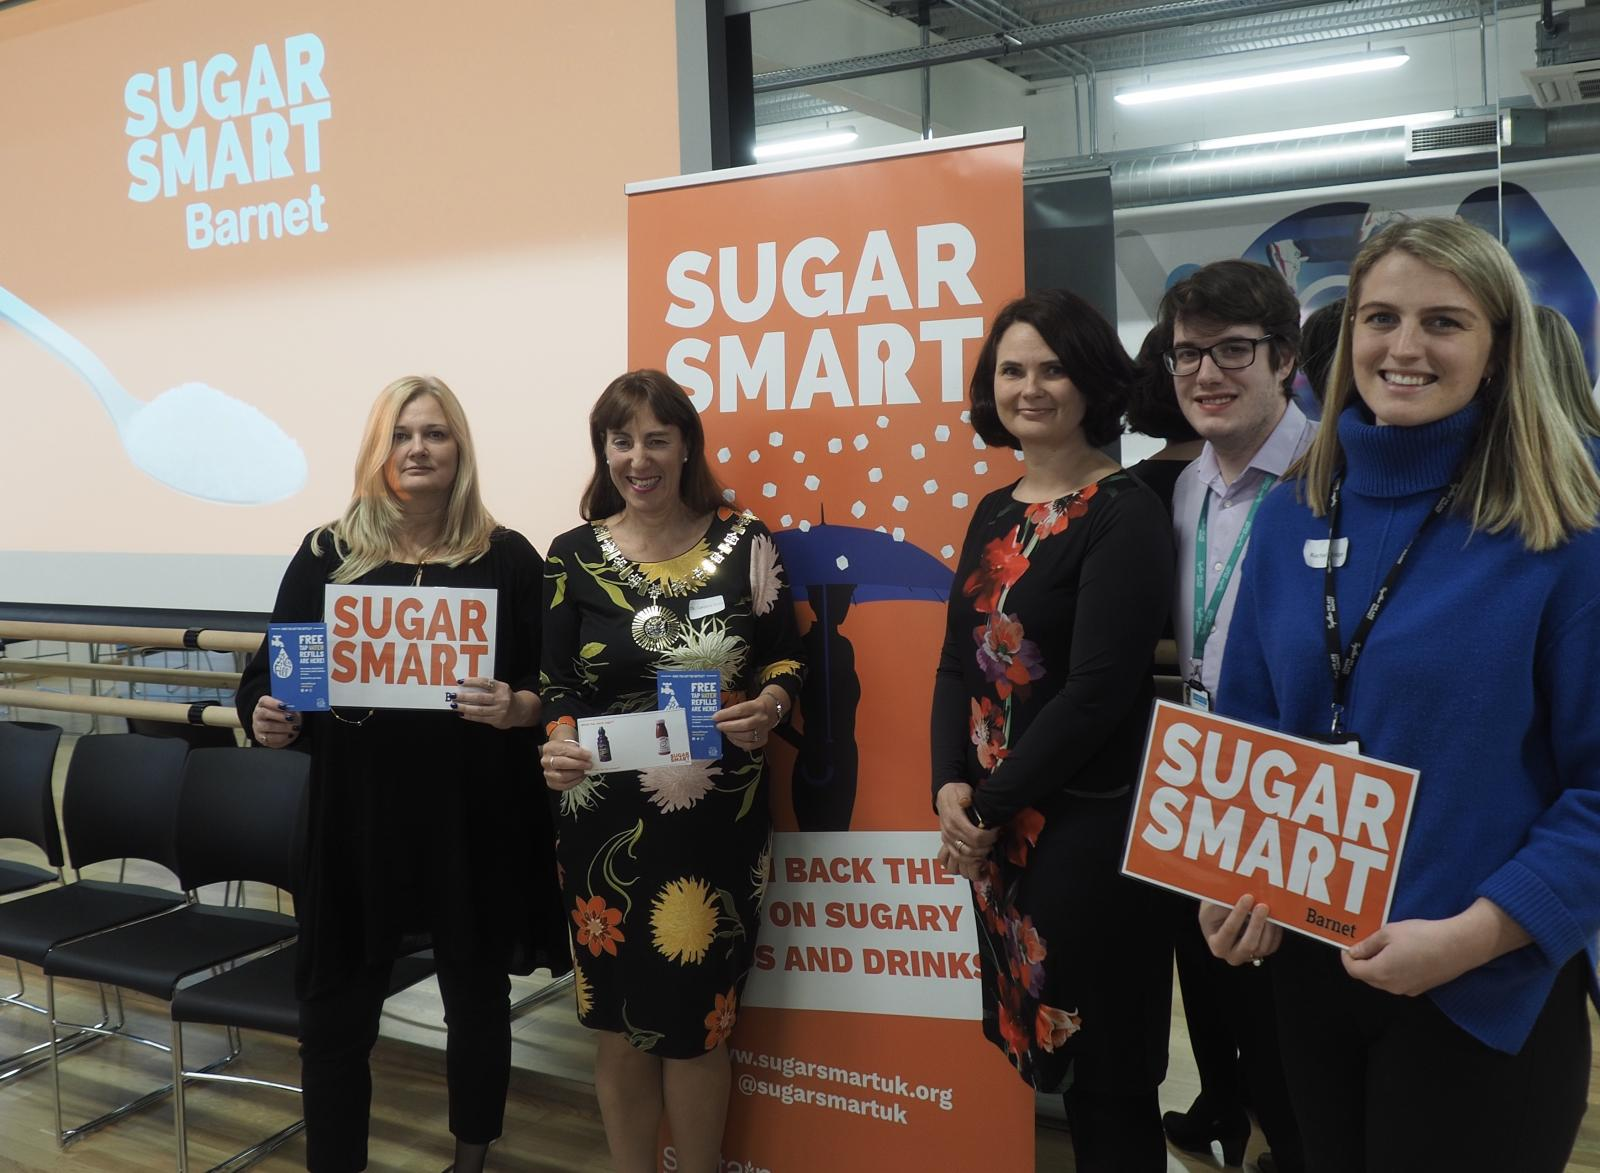 SUGAR SMART Barnet Launch Mayor Caroline Stock DpH Tamara Djuretic coordinator Rachel Hodge